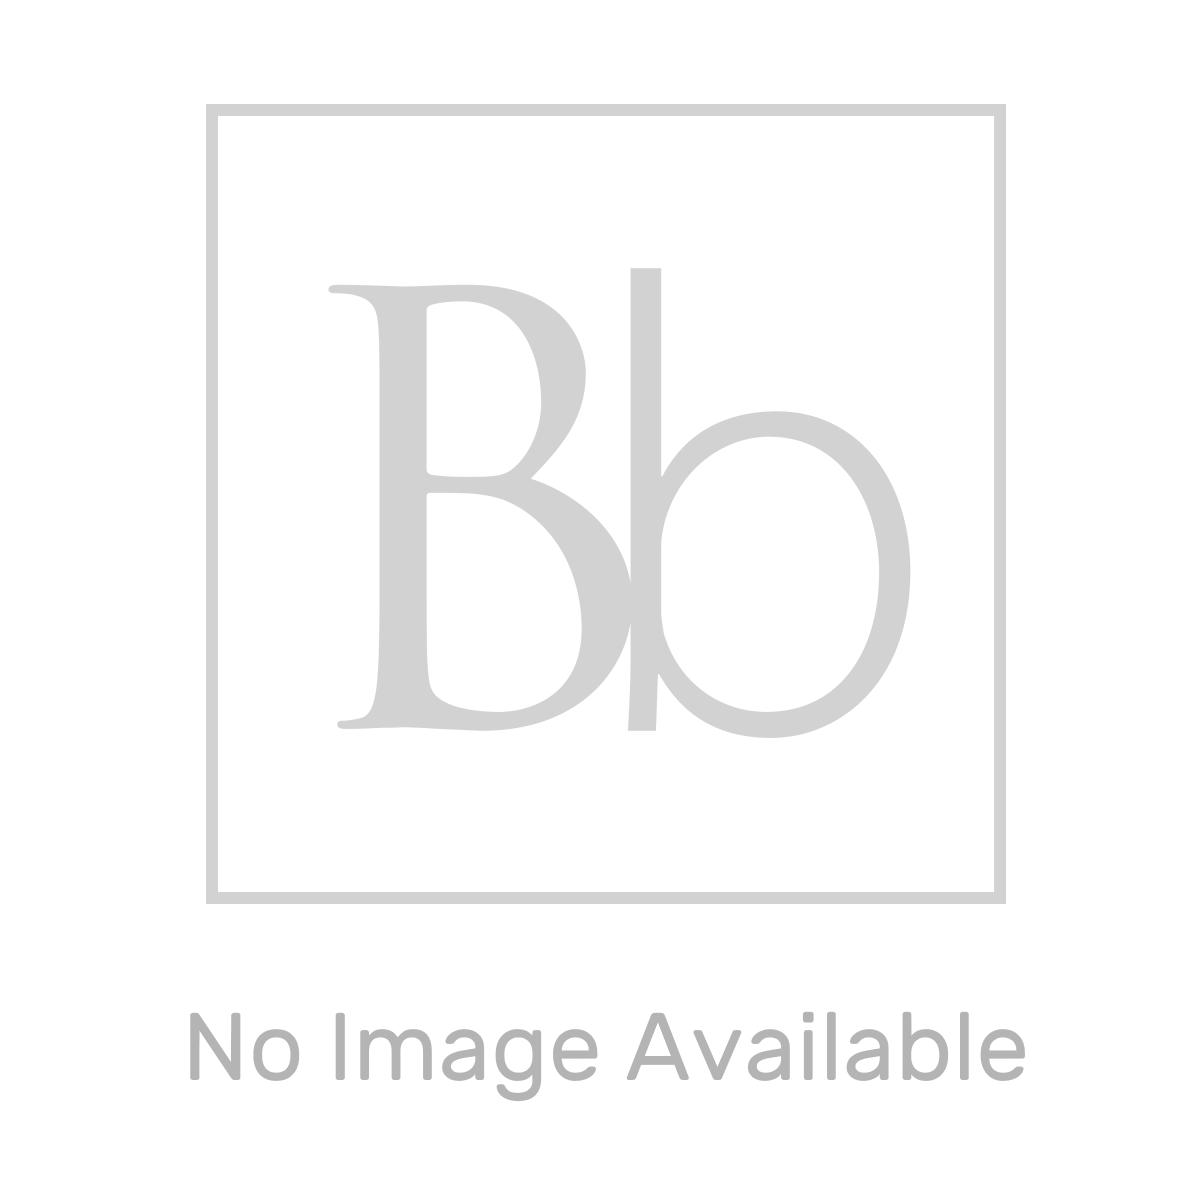 RAK Compact Shower Suite with Pacific D Shaped Shower Enclosure